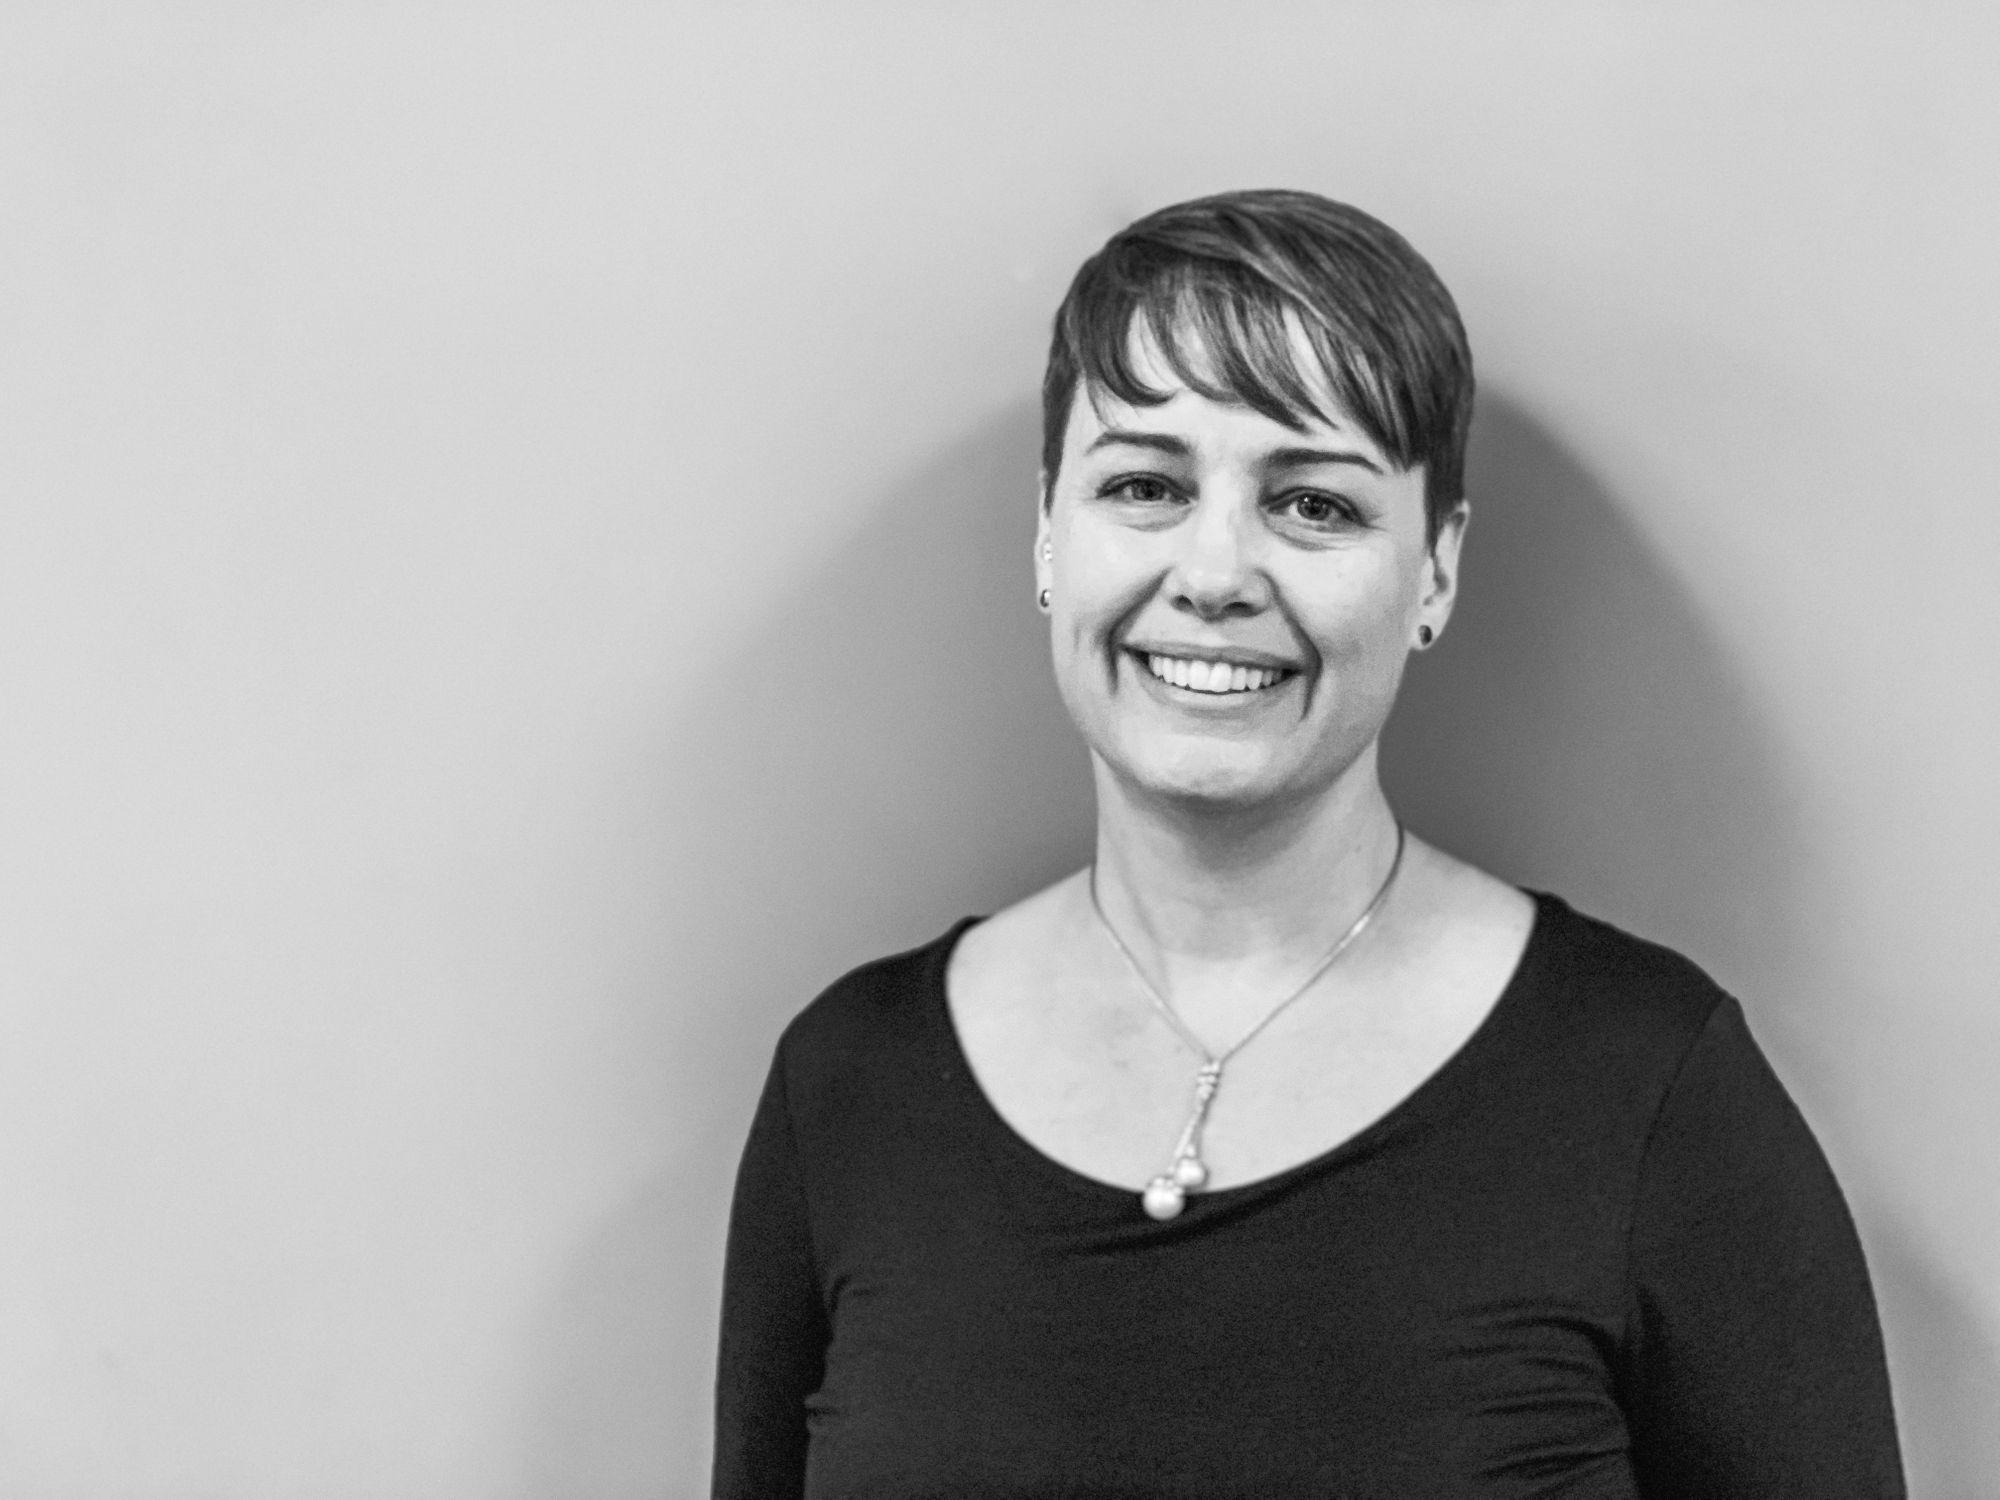 Laurie Boschini - Head of Research & Development